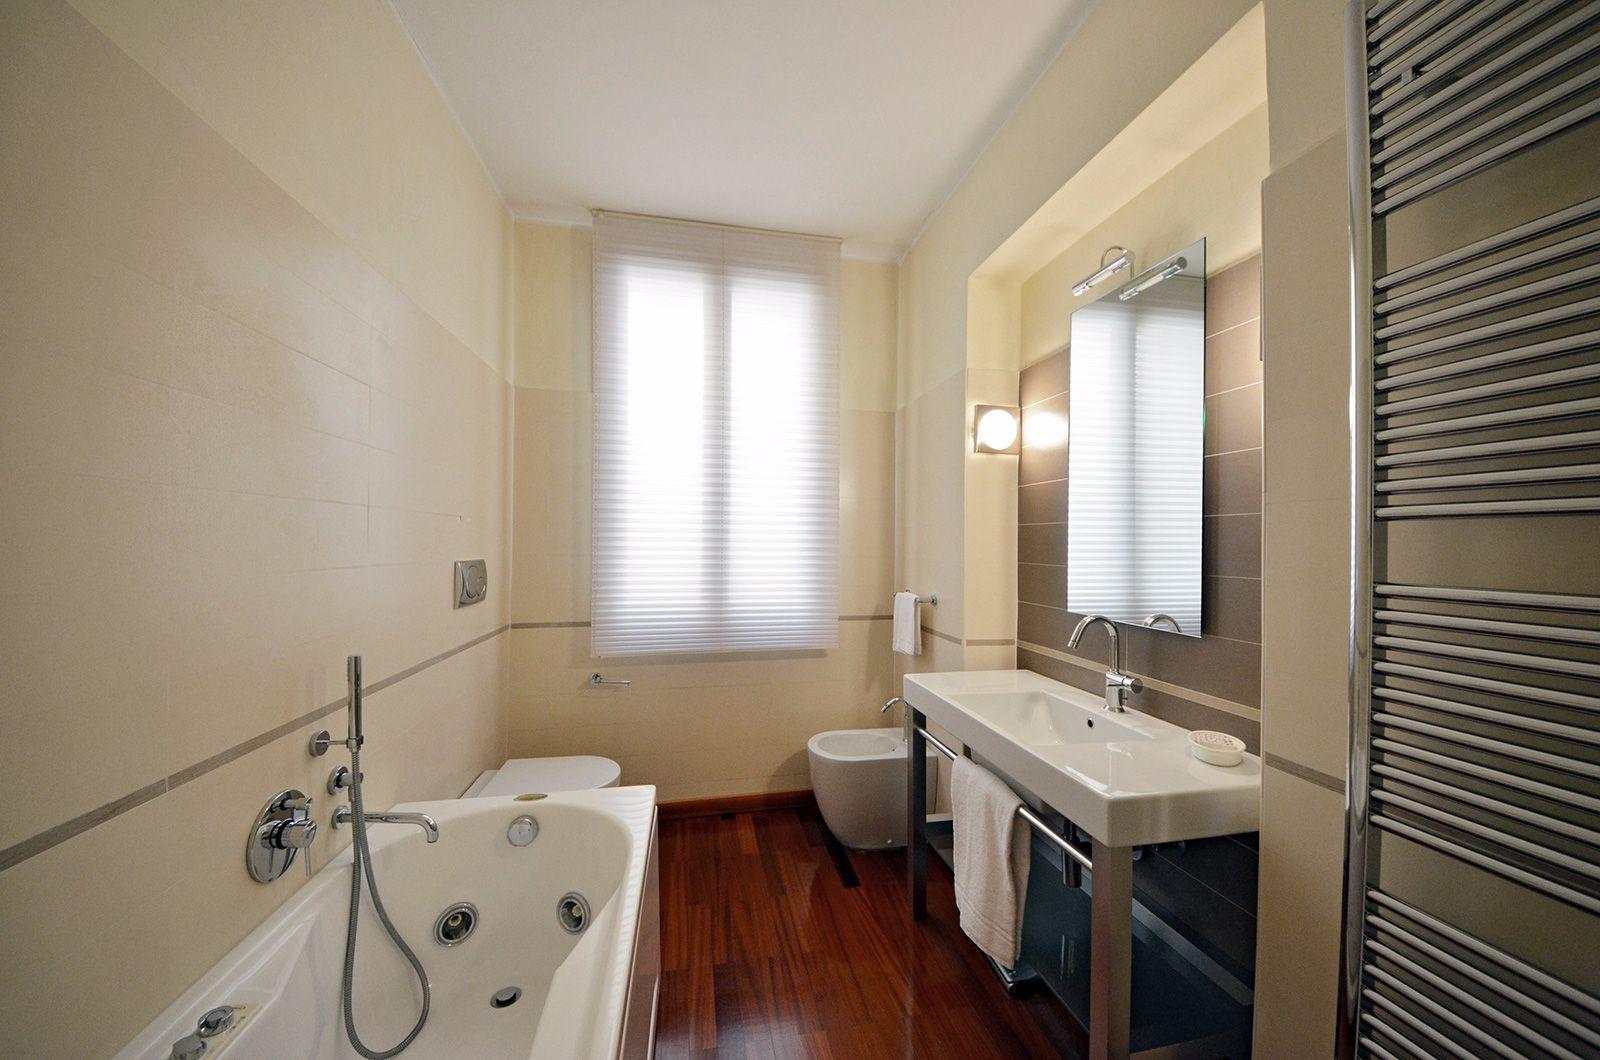 newly renovated bathroom with Jacuzzi bathtub